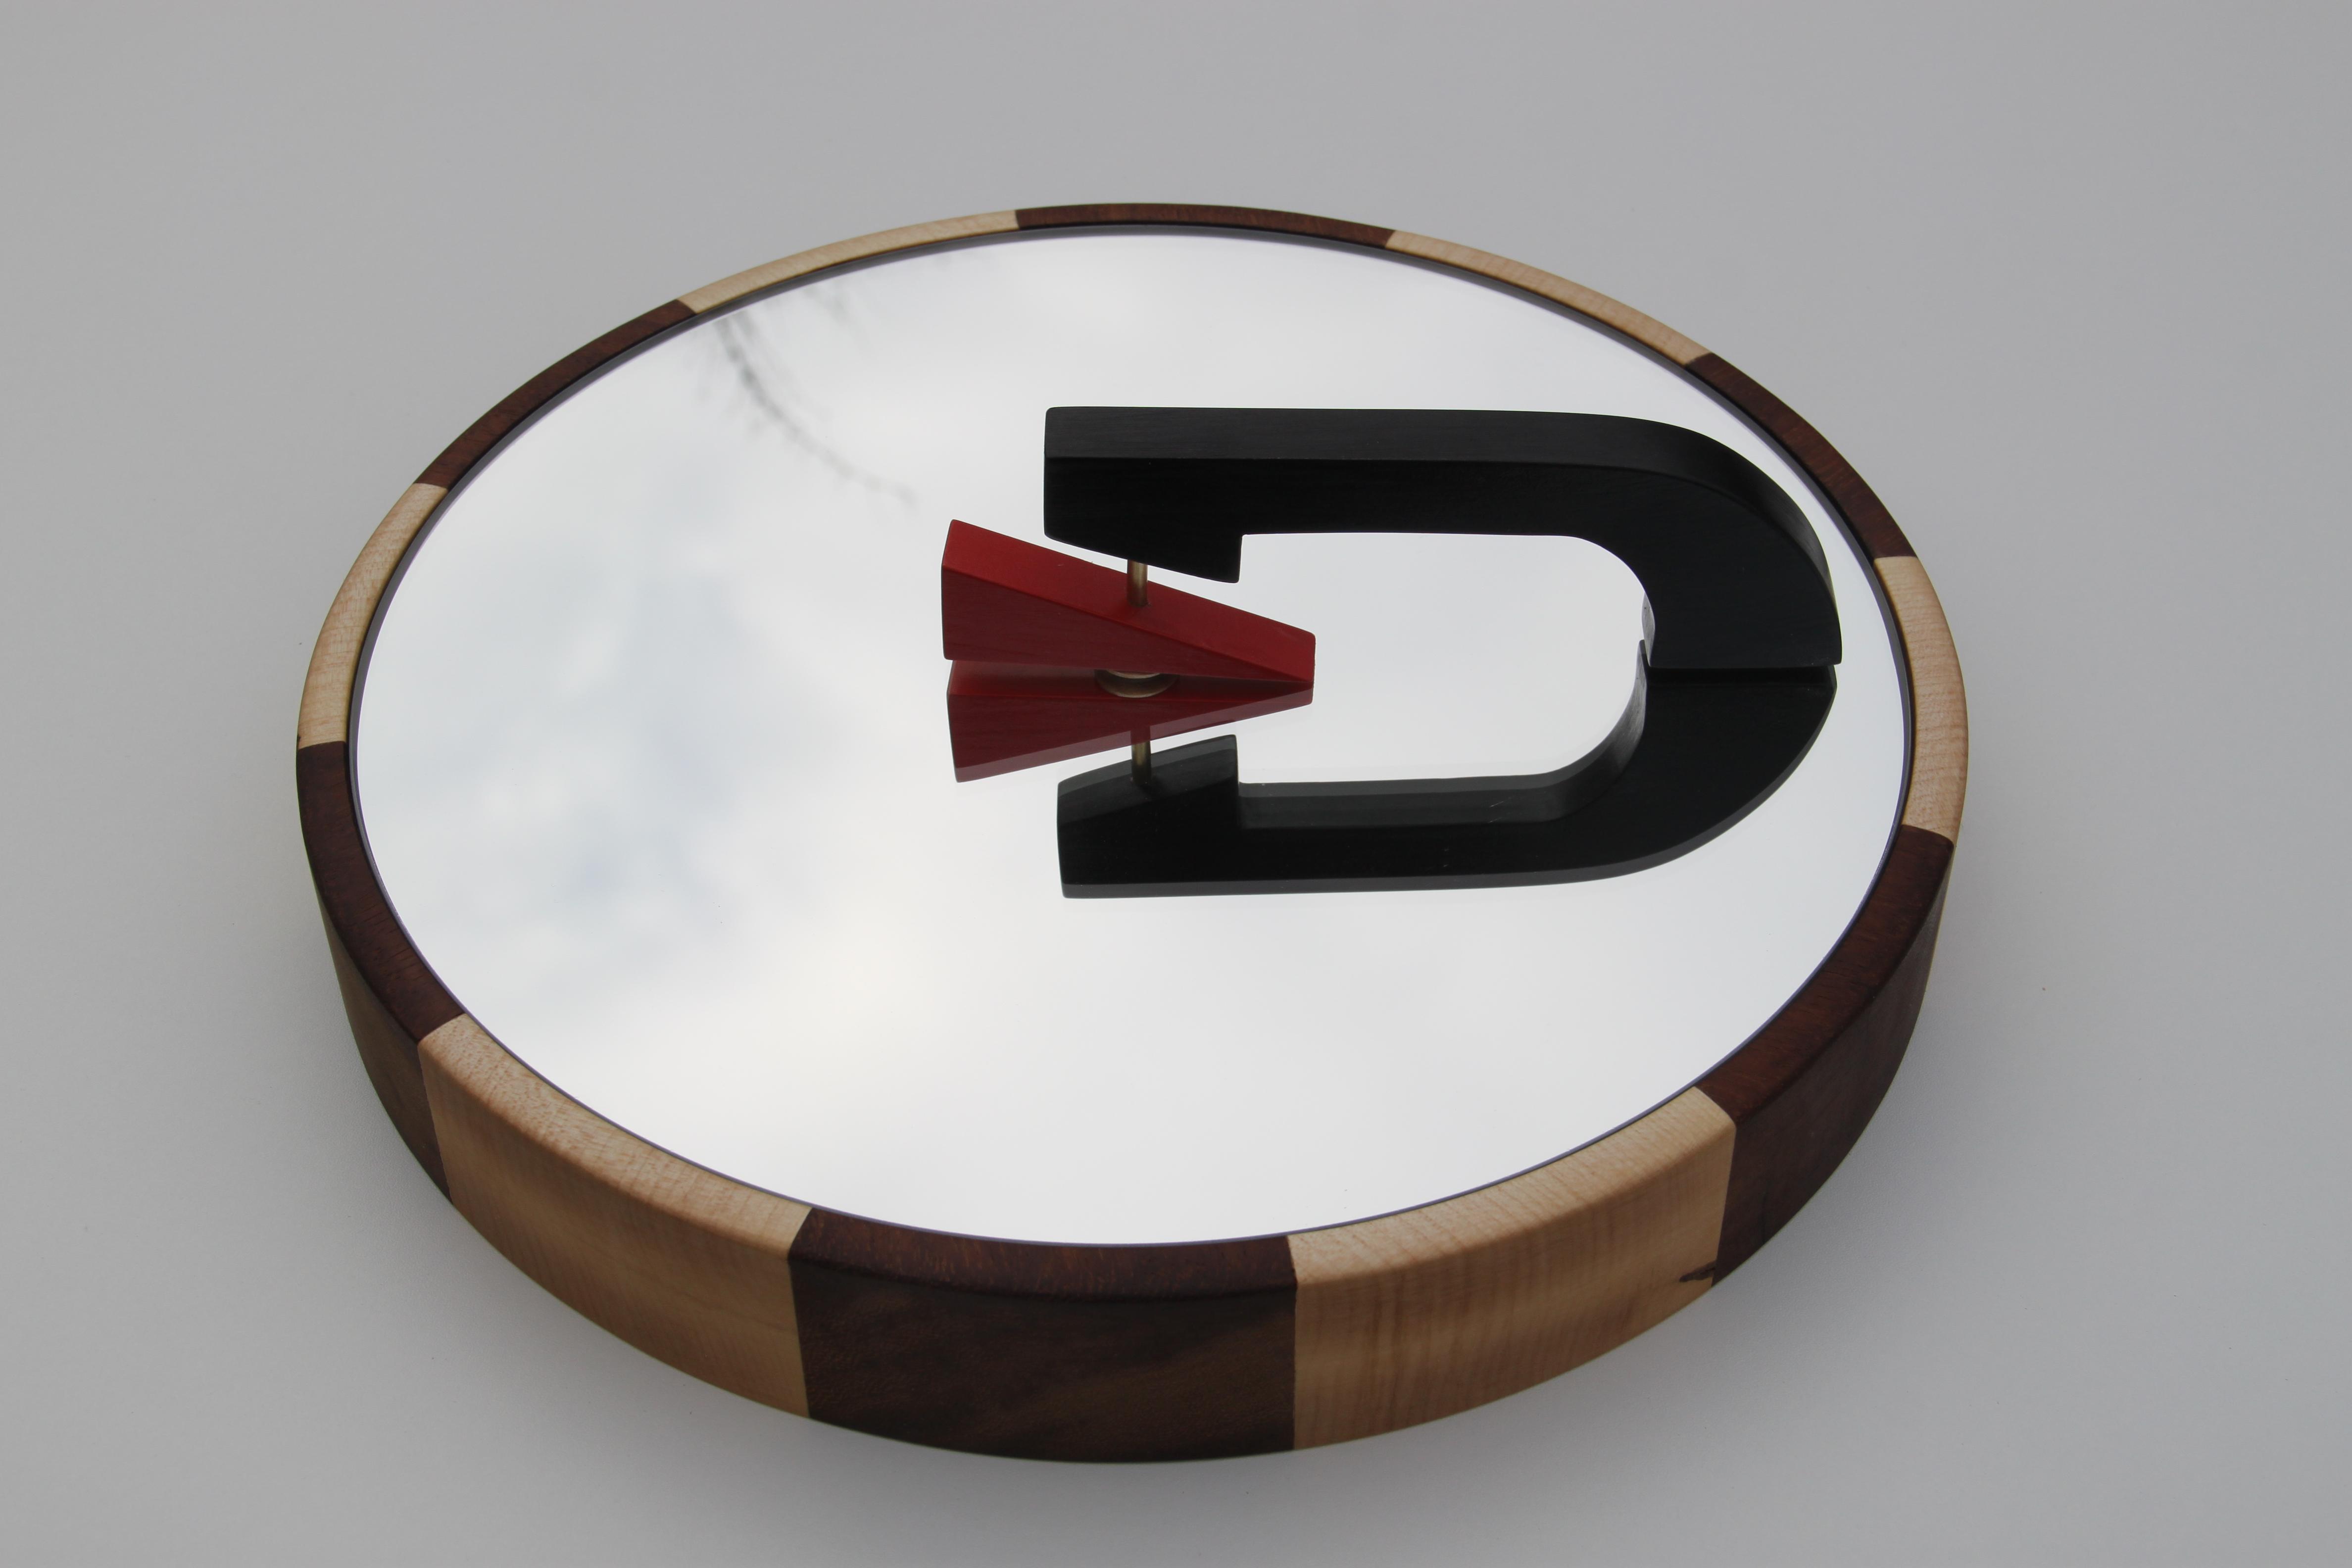 dictum gewinnspiel 2018 2019 dictum handwerksgalerie. Black Bedroom Furniture Sets. Home Design Ideas